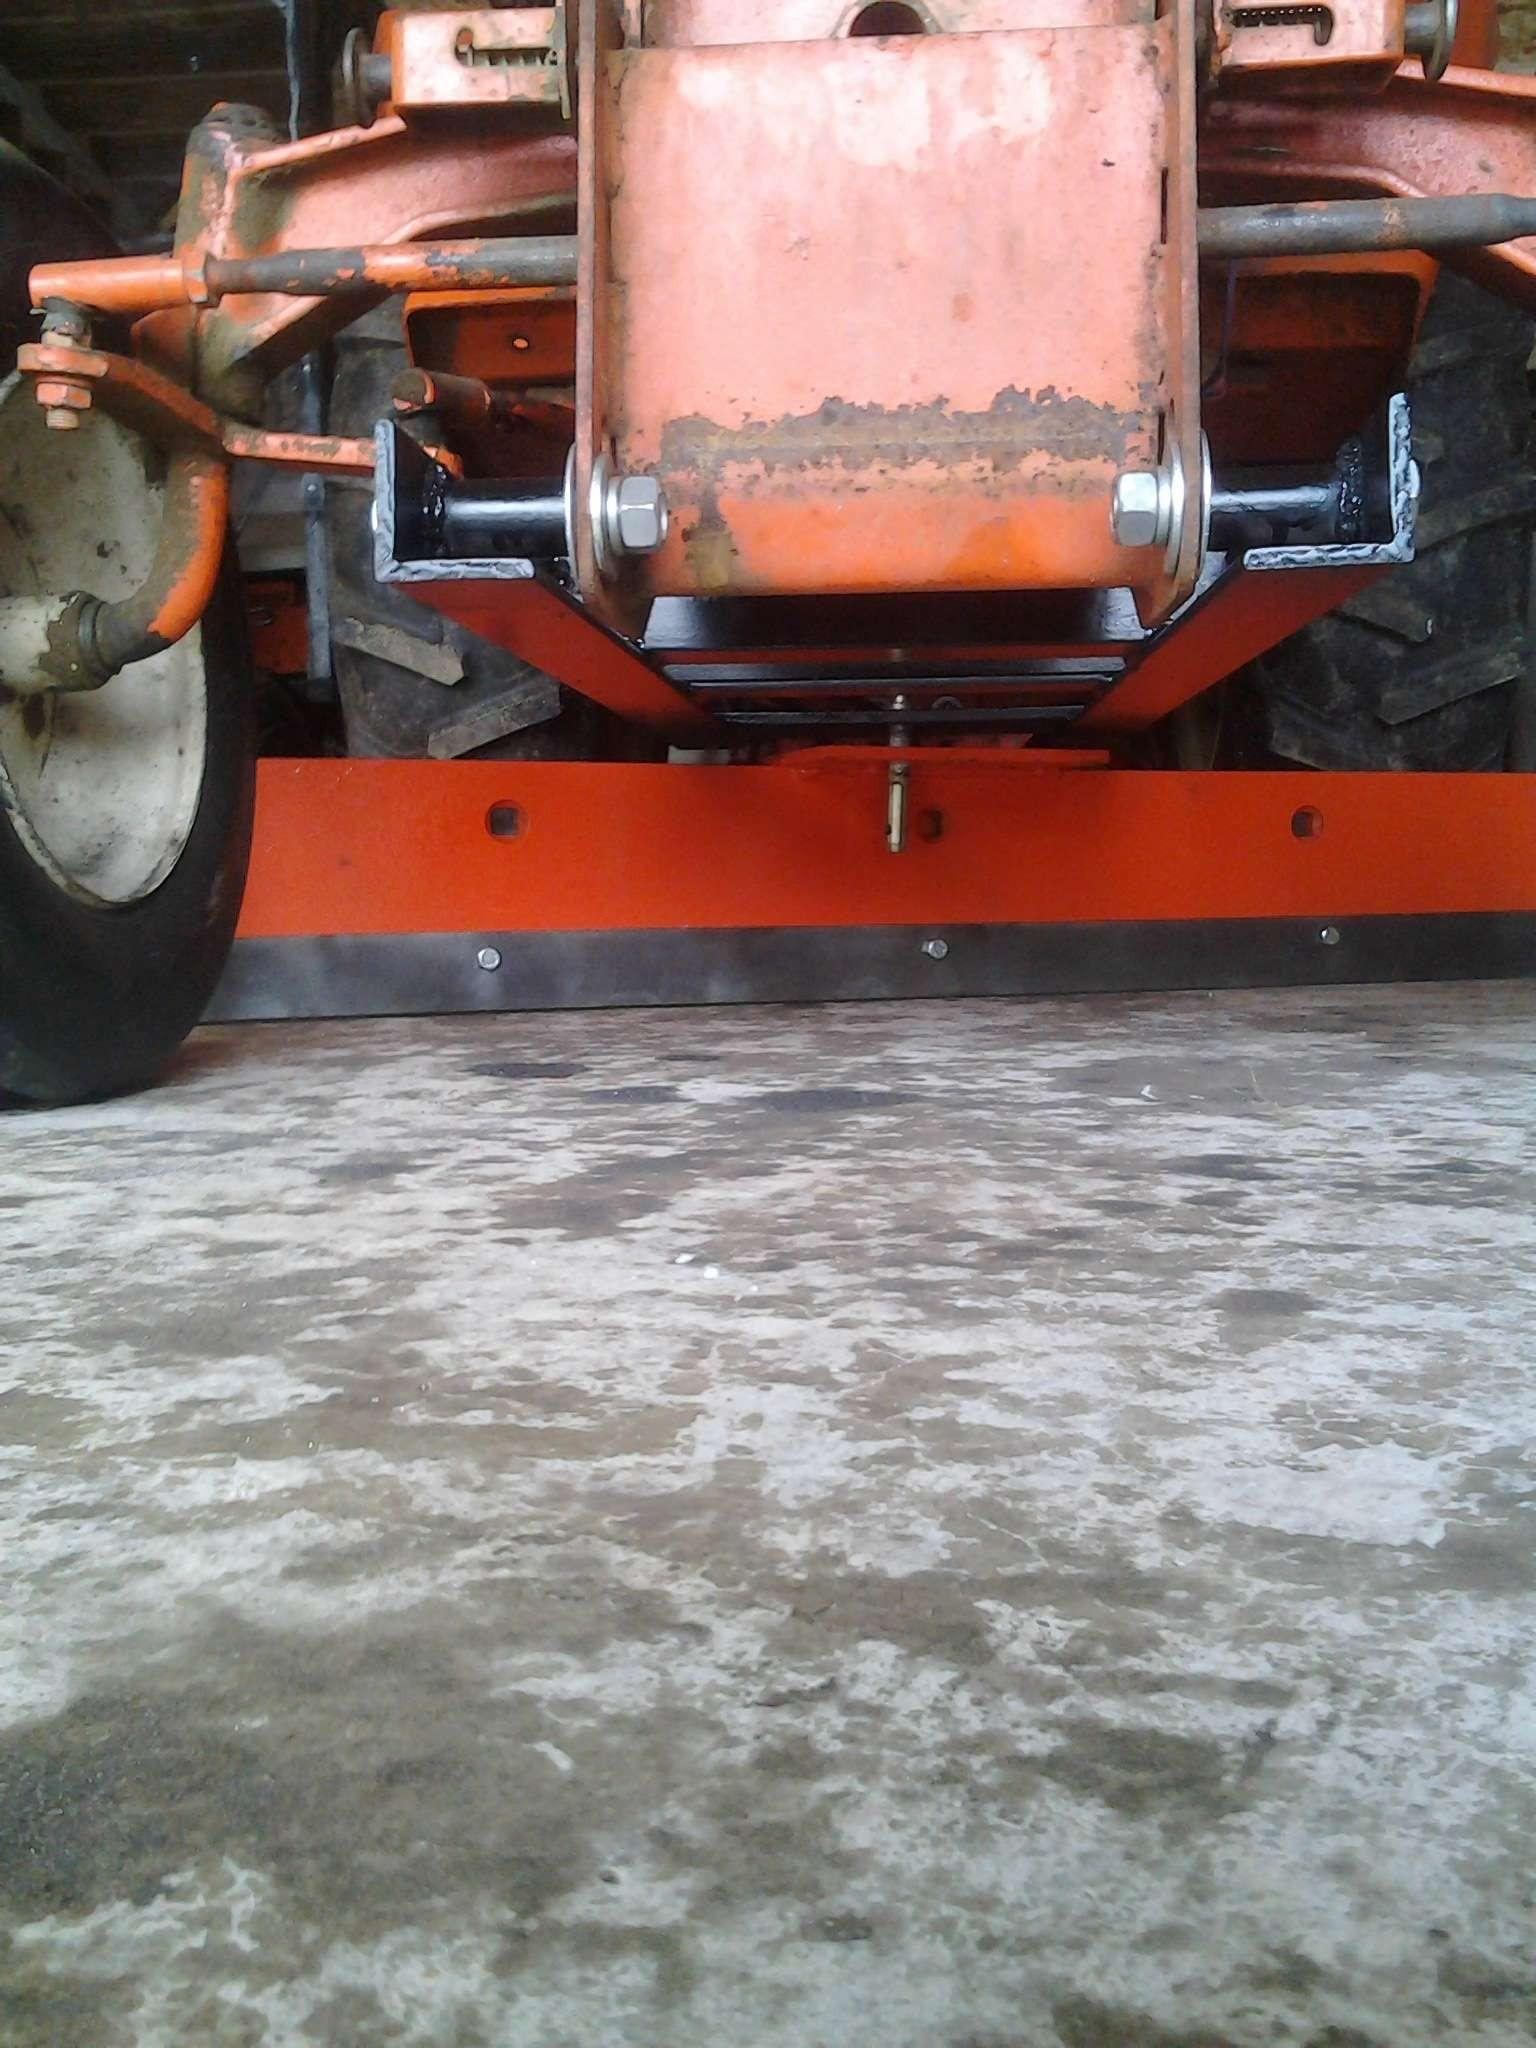 Craftsman Lawn Tractor Grader : Mytractorforum the friendliest tractor forum and